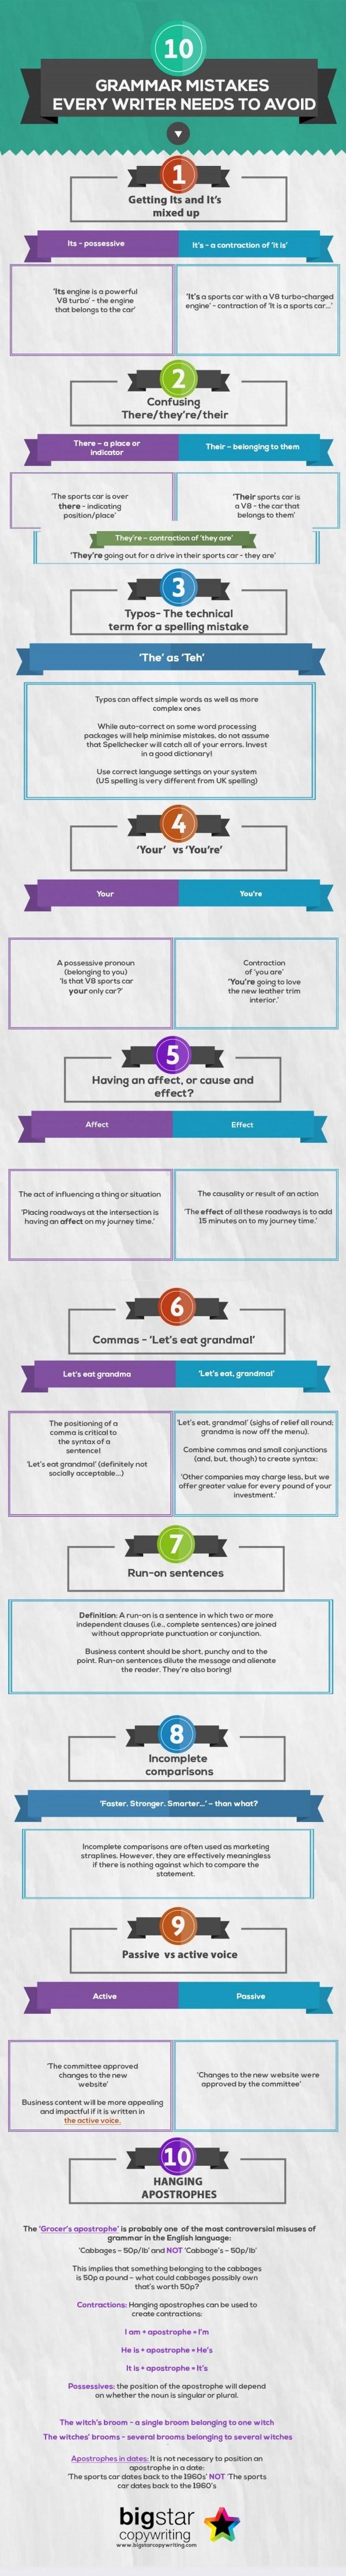 10 Grammar Mistakes Every Writer Needs To Avoid